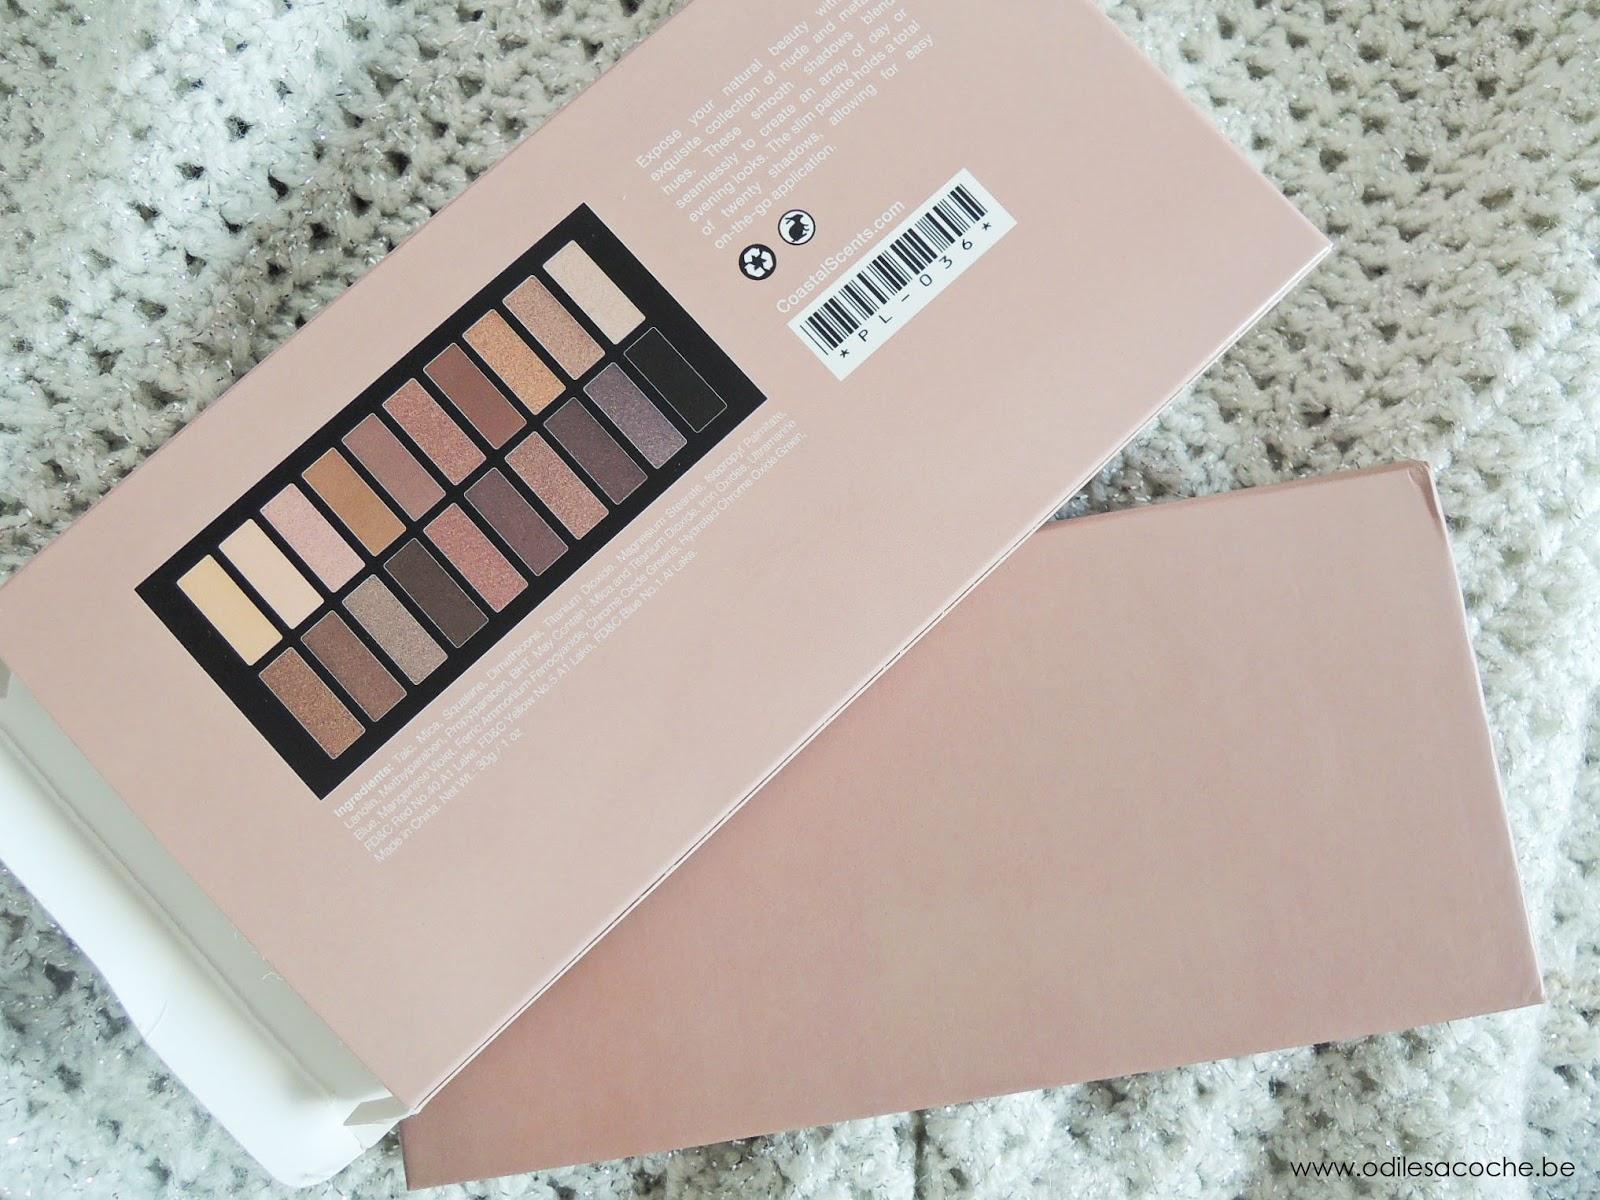 packaging back revealed palette